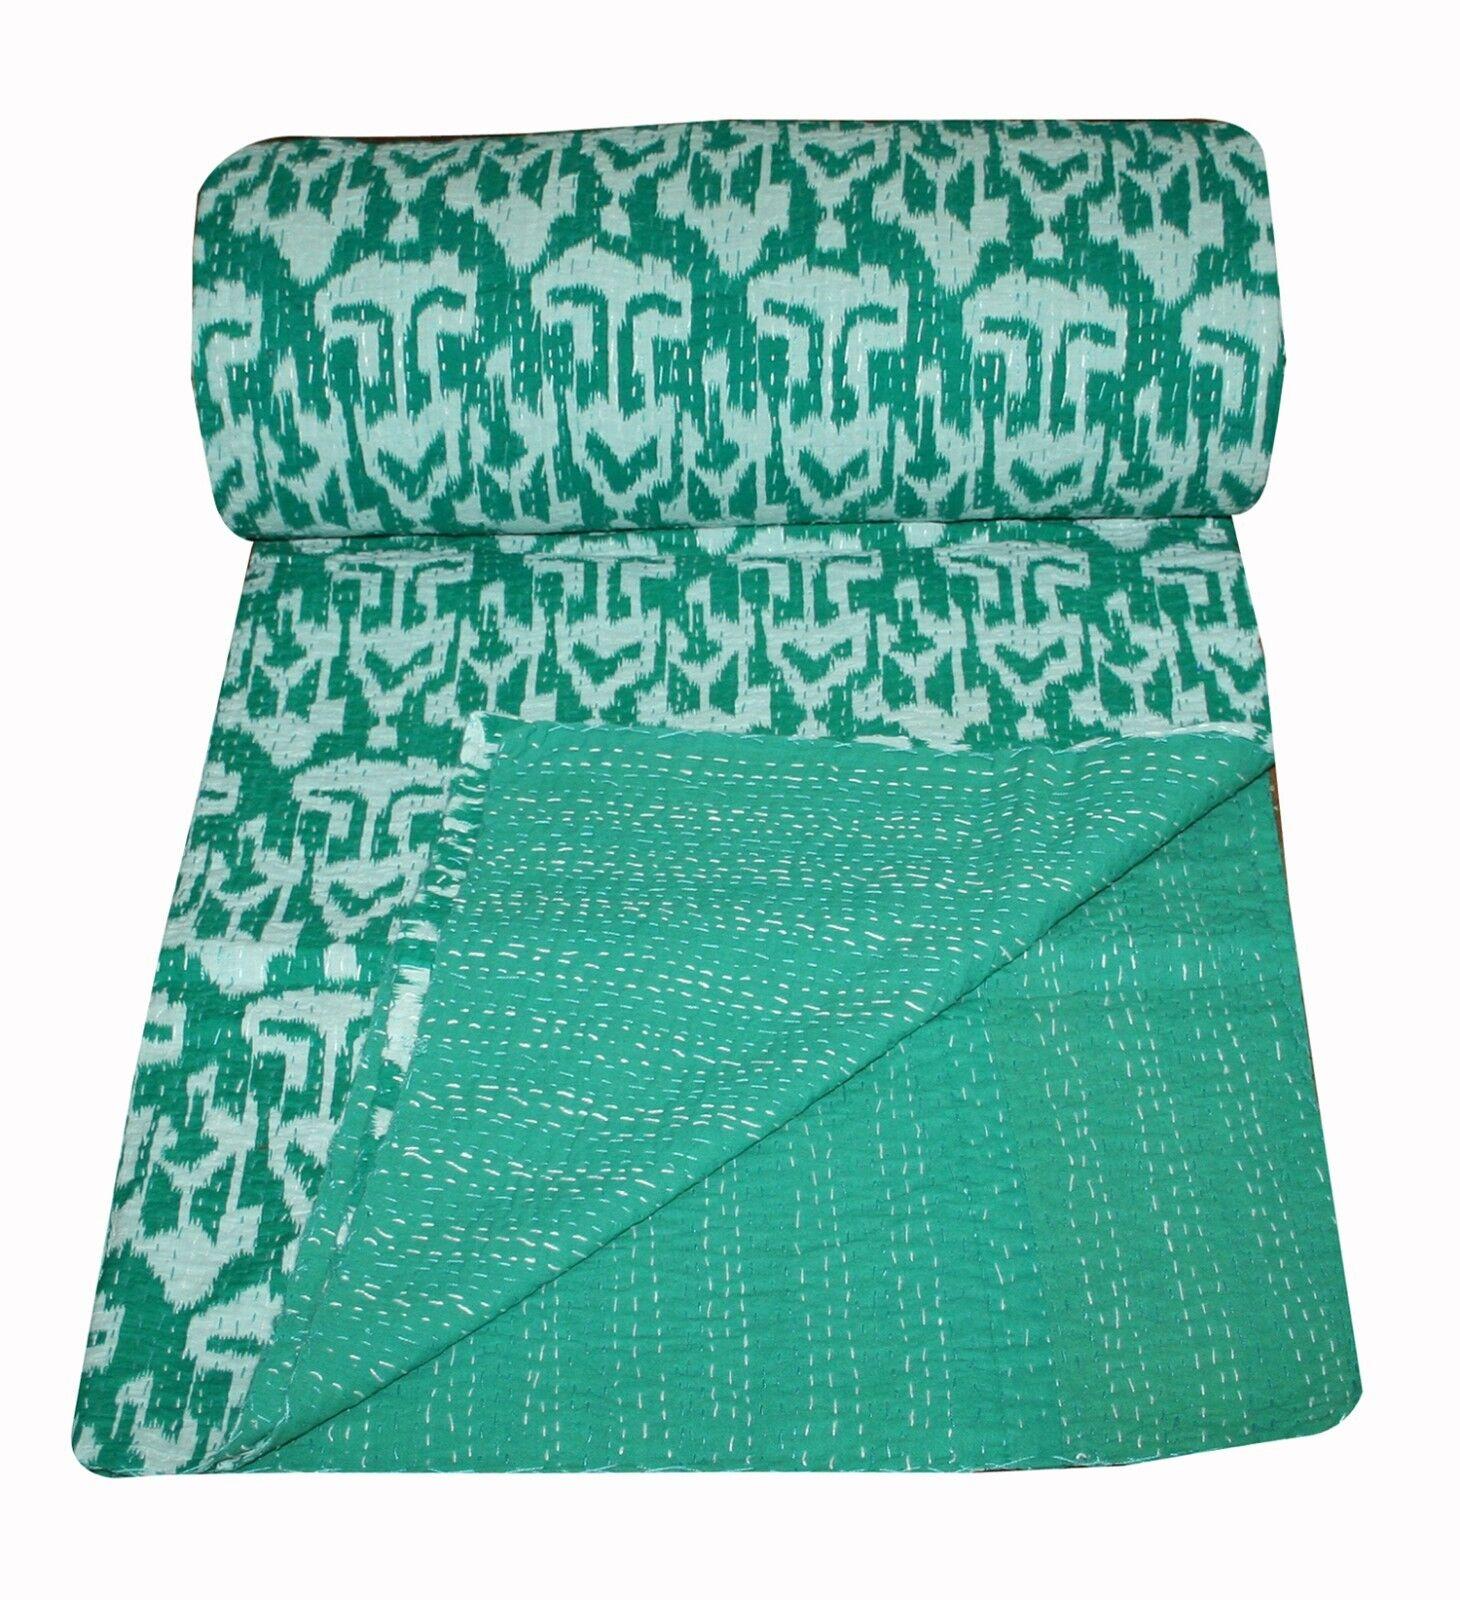 Vintage Indian Cotton Ikat Handmade Kantha Quilt Bedspread- Queen Throw Decor